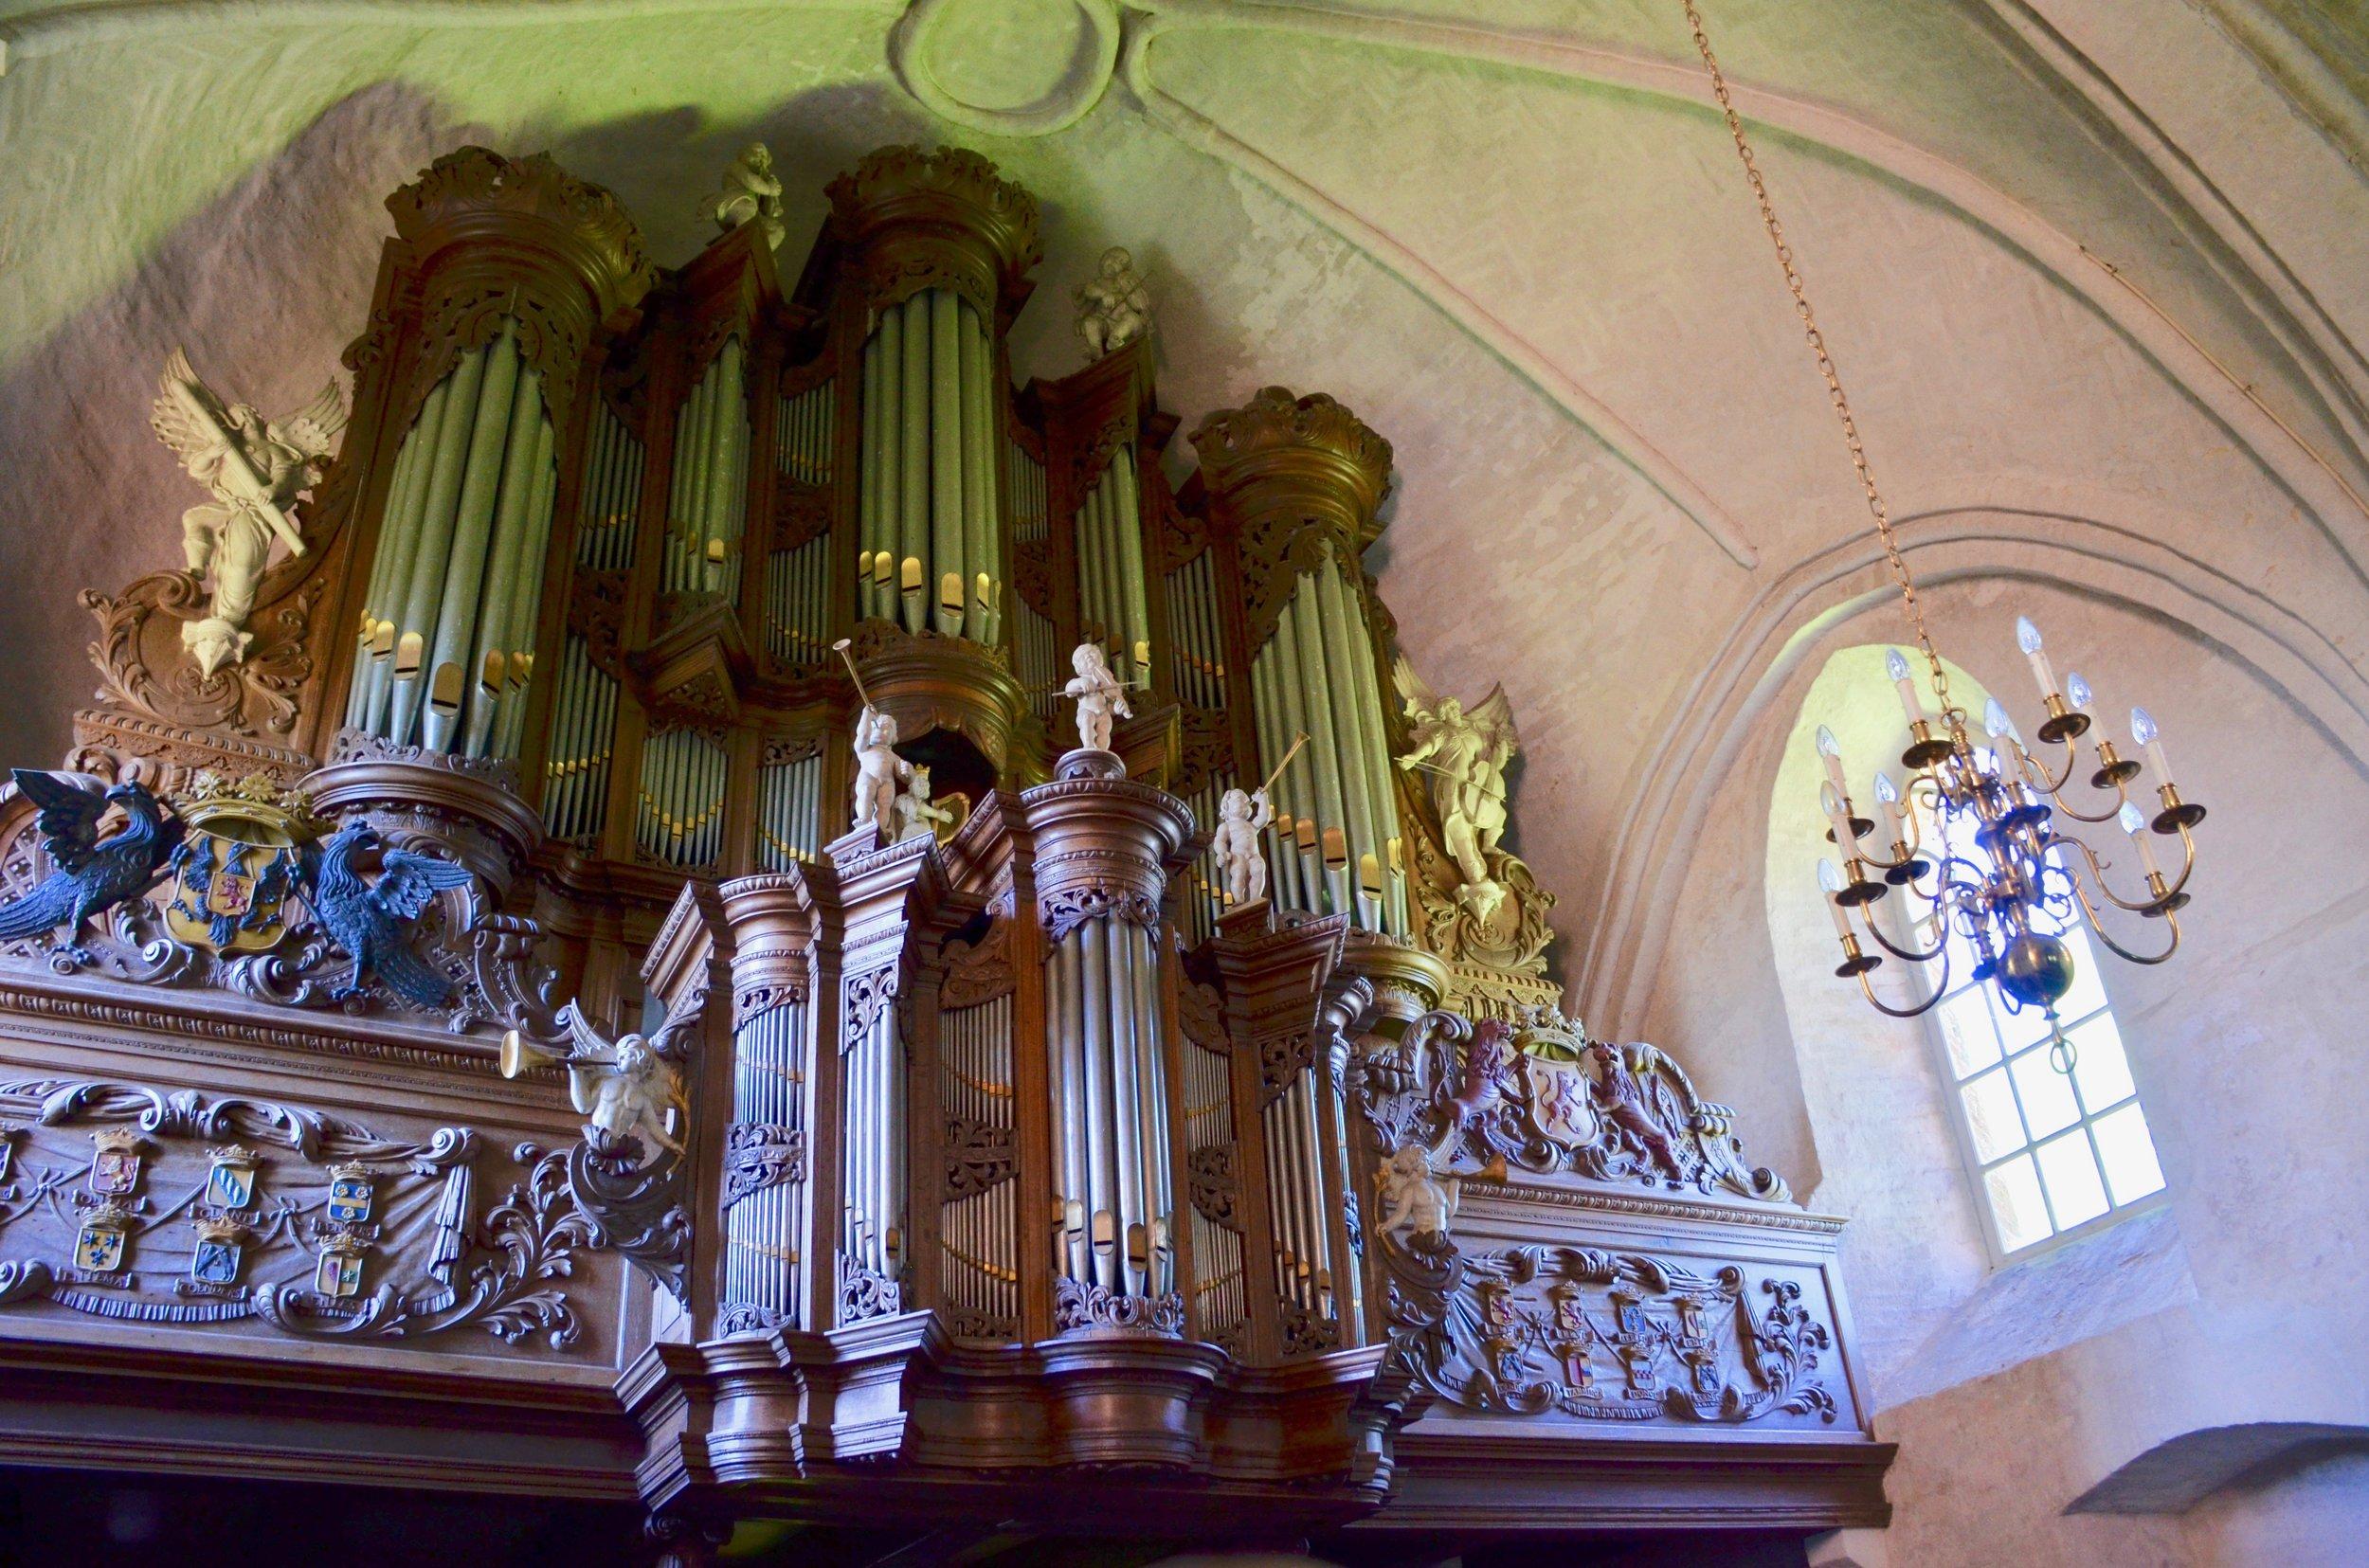 1733 Hinsz Organ, Leens, Holland.